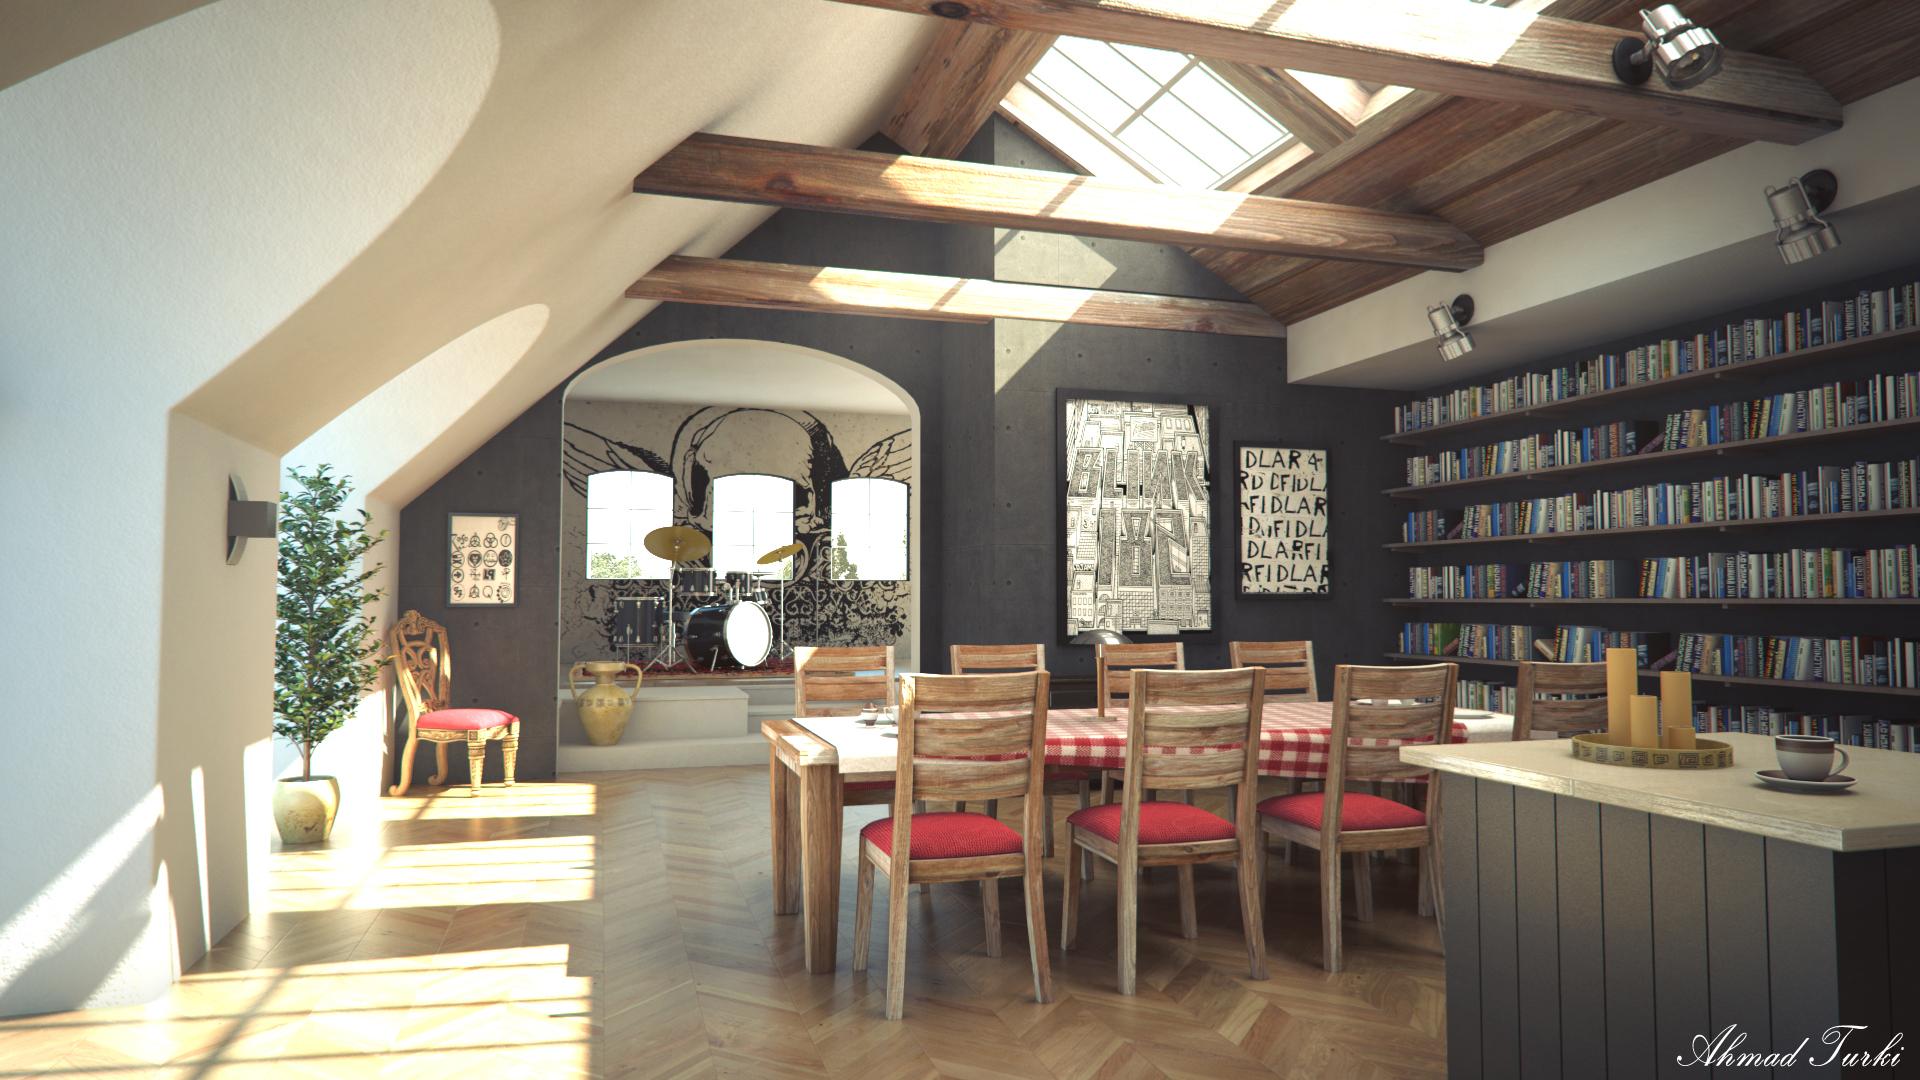 Book Shop By AhmadTurk